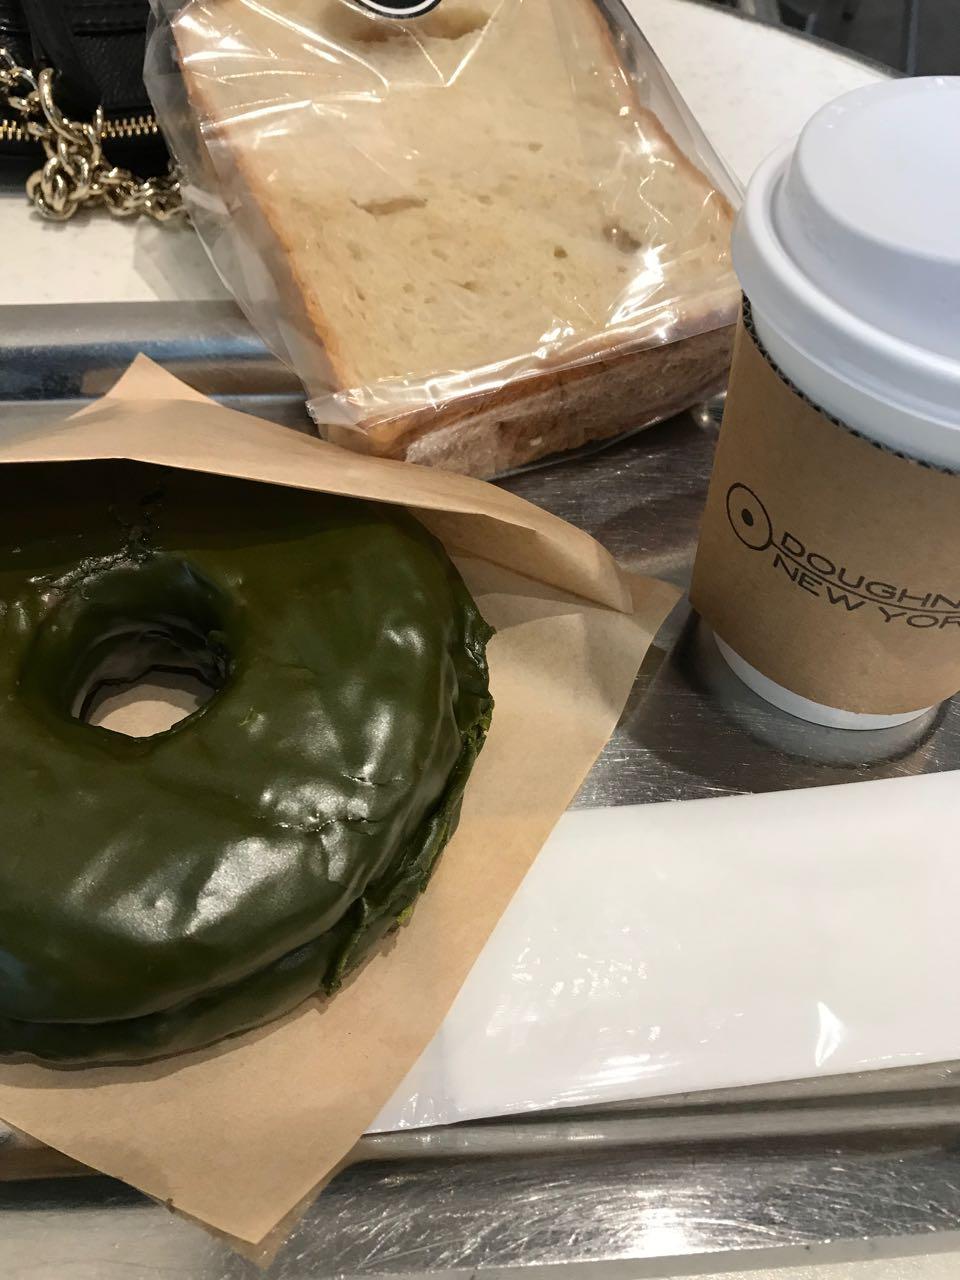 tokyo donut plant.jpg